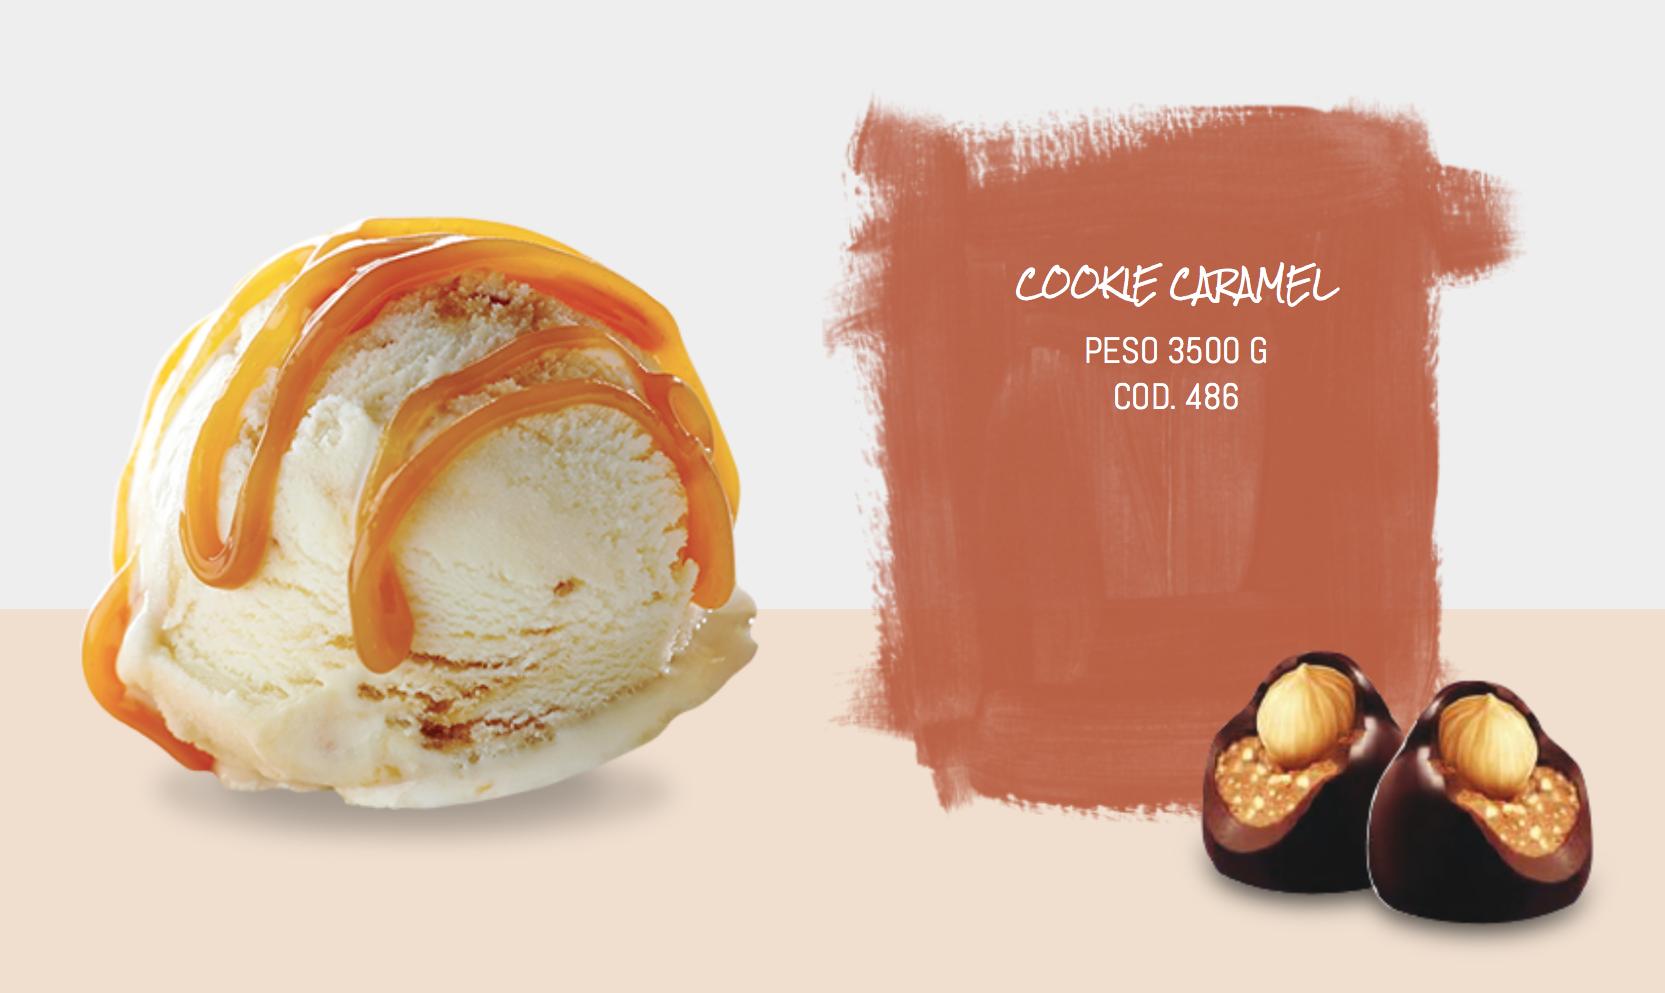 Mantecato Cookie Caramel